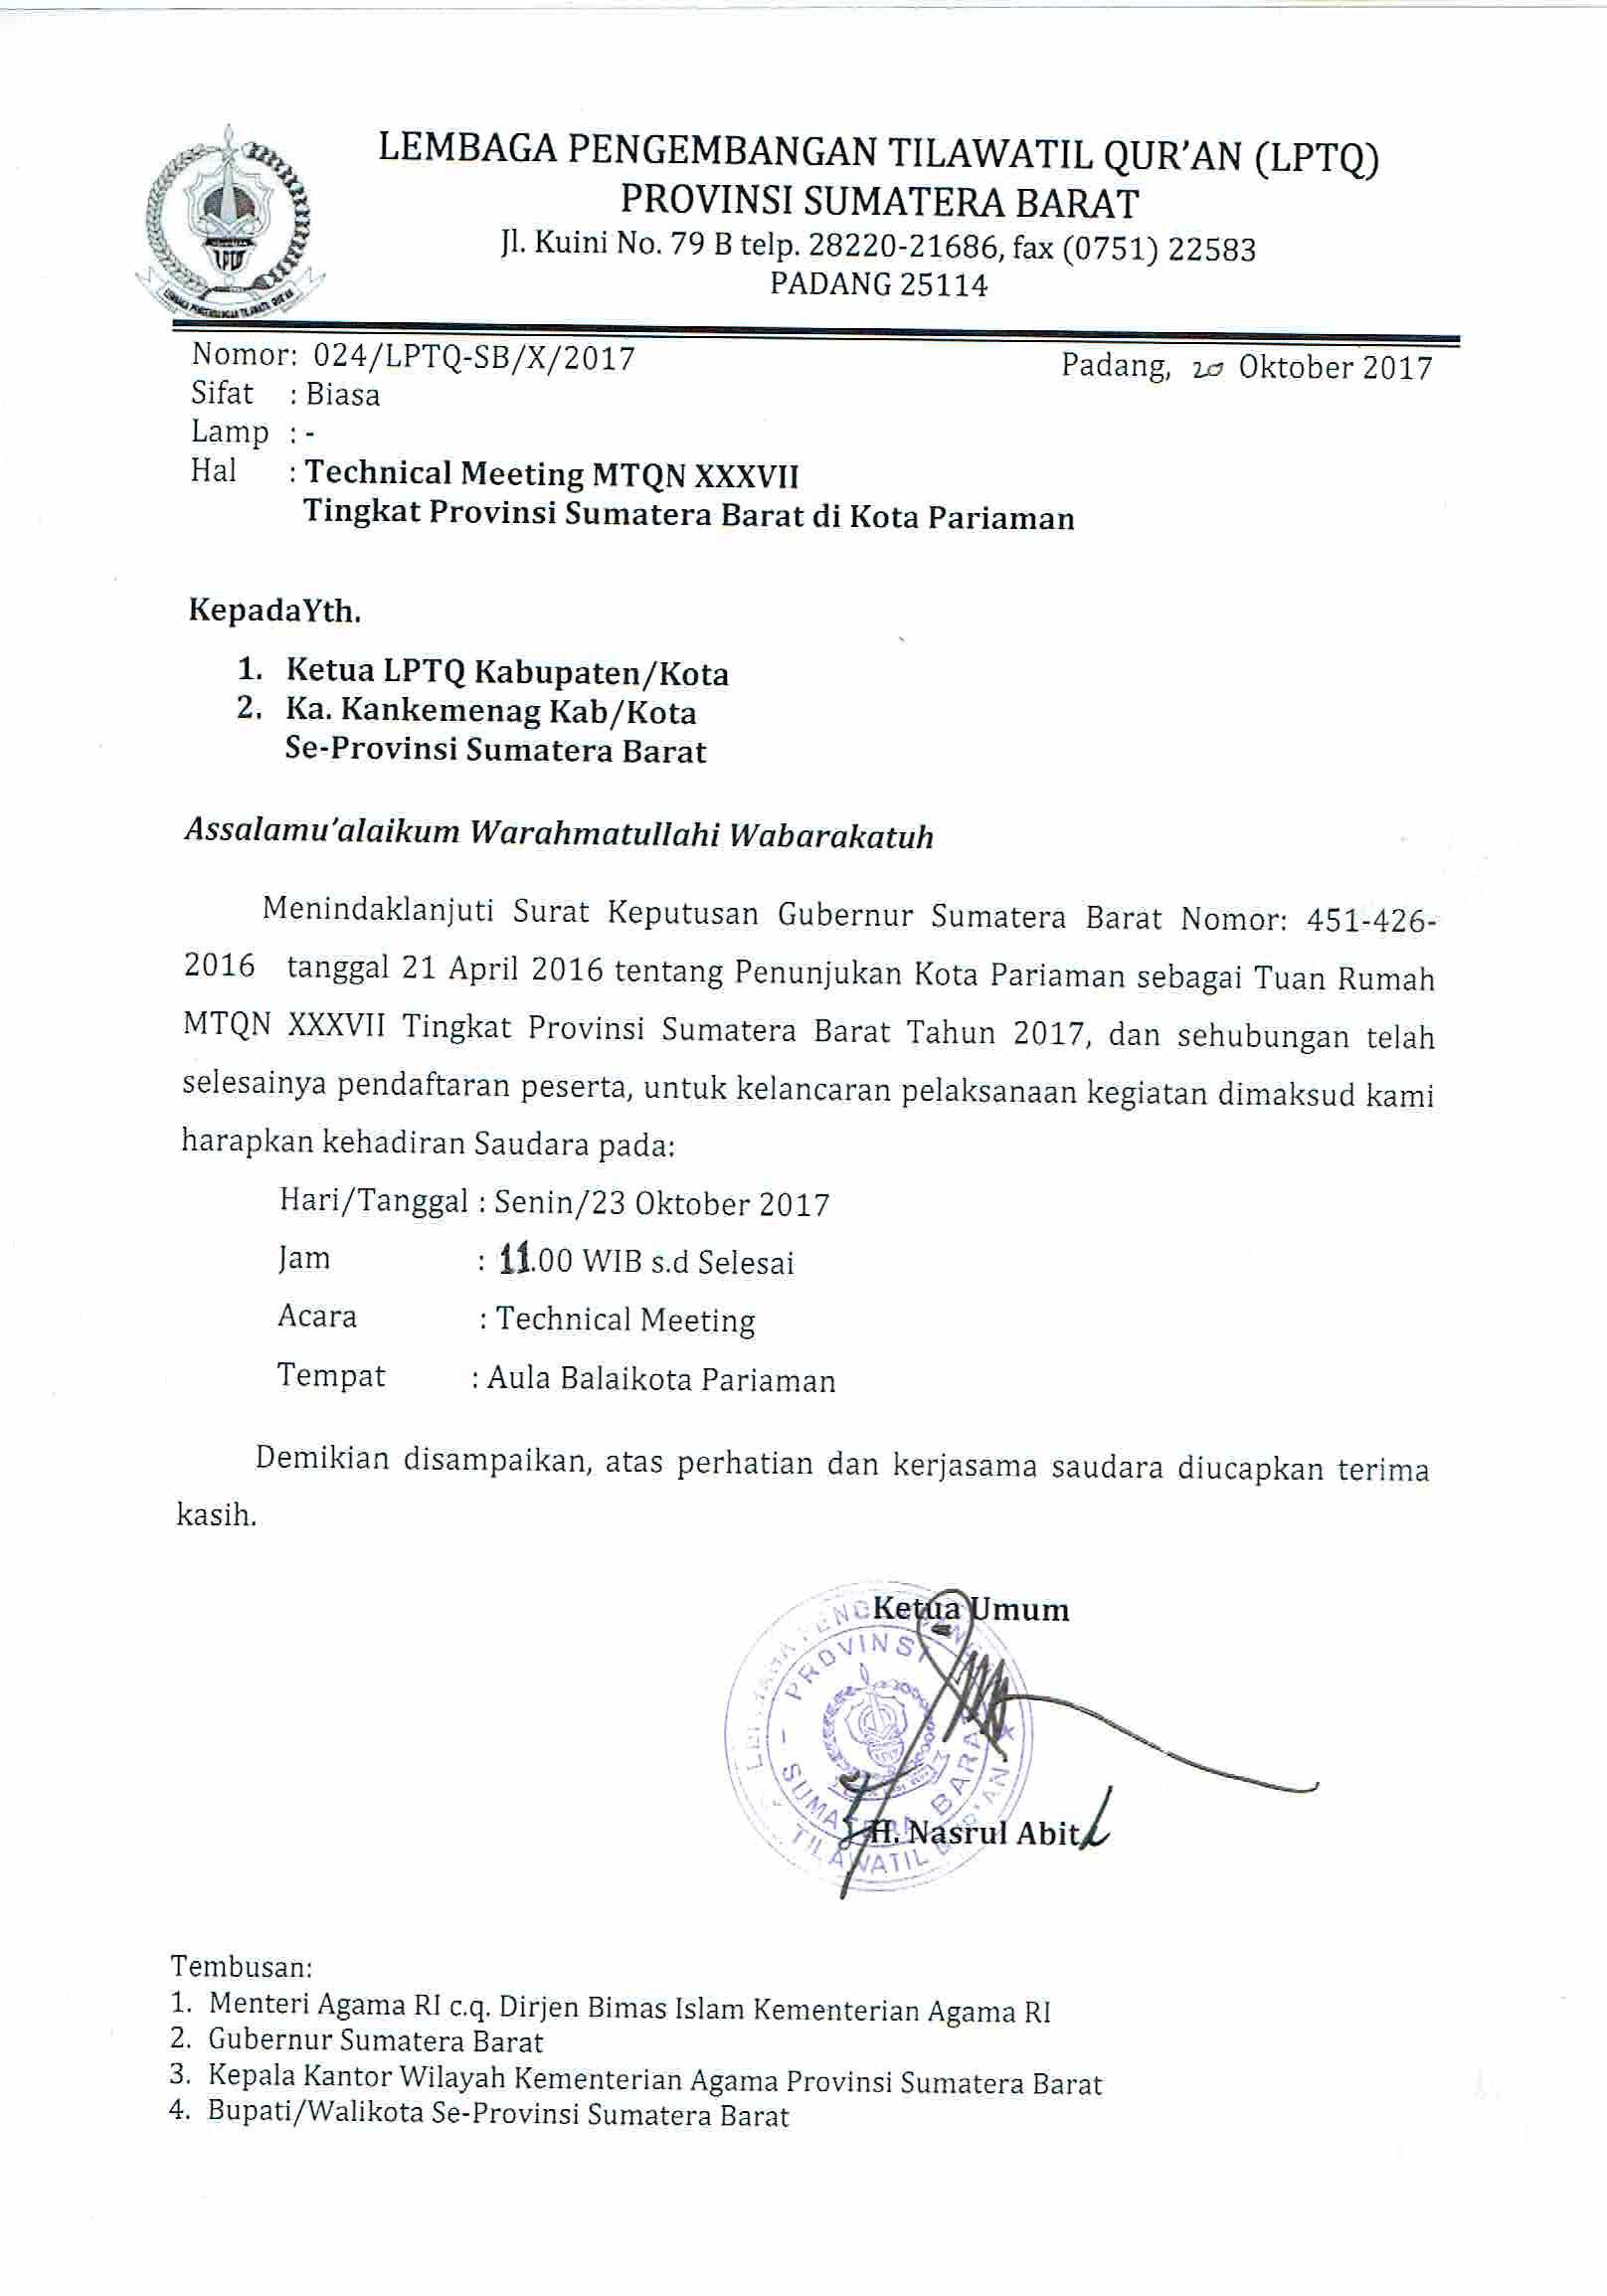 Contoh Surat Undangan Resmi Untuk Gubernur : contoh, surat, undangan, resmi, untuk, gubernur, Surat, Undangan, Technical, Meeting, XXXVII, Tingkat, Provinsi, Sumatera, Barat, Kementerian, Agama